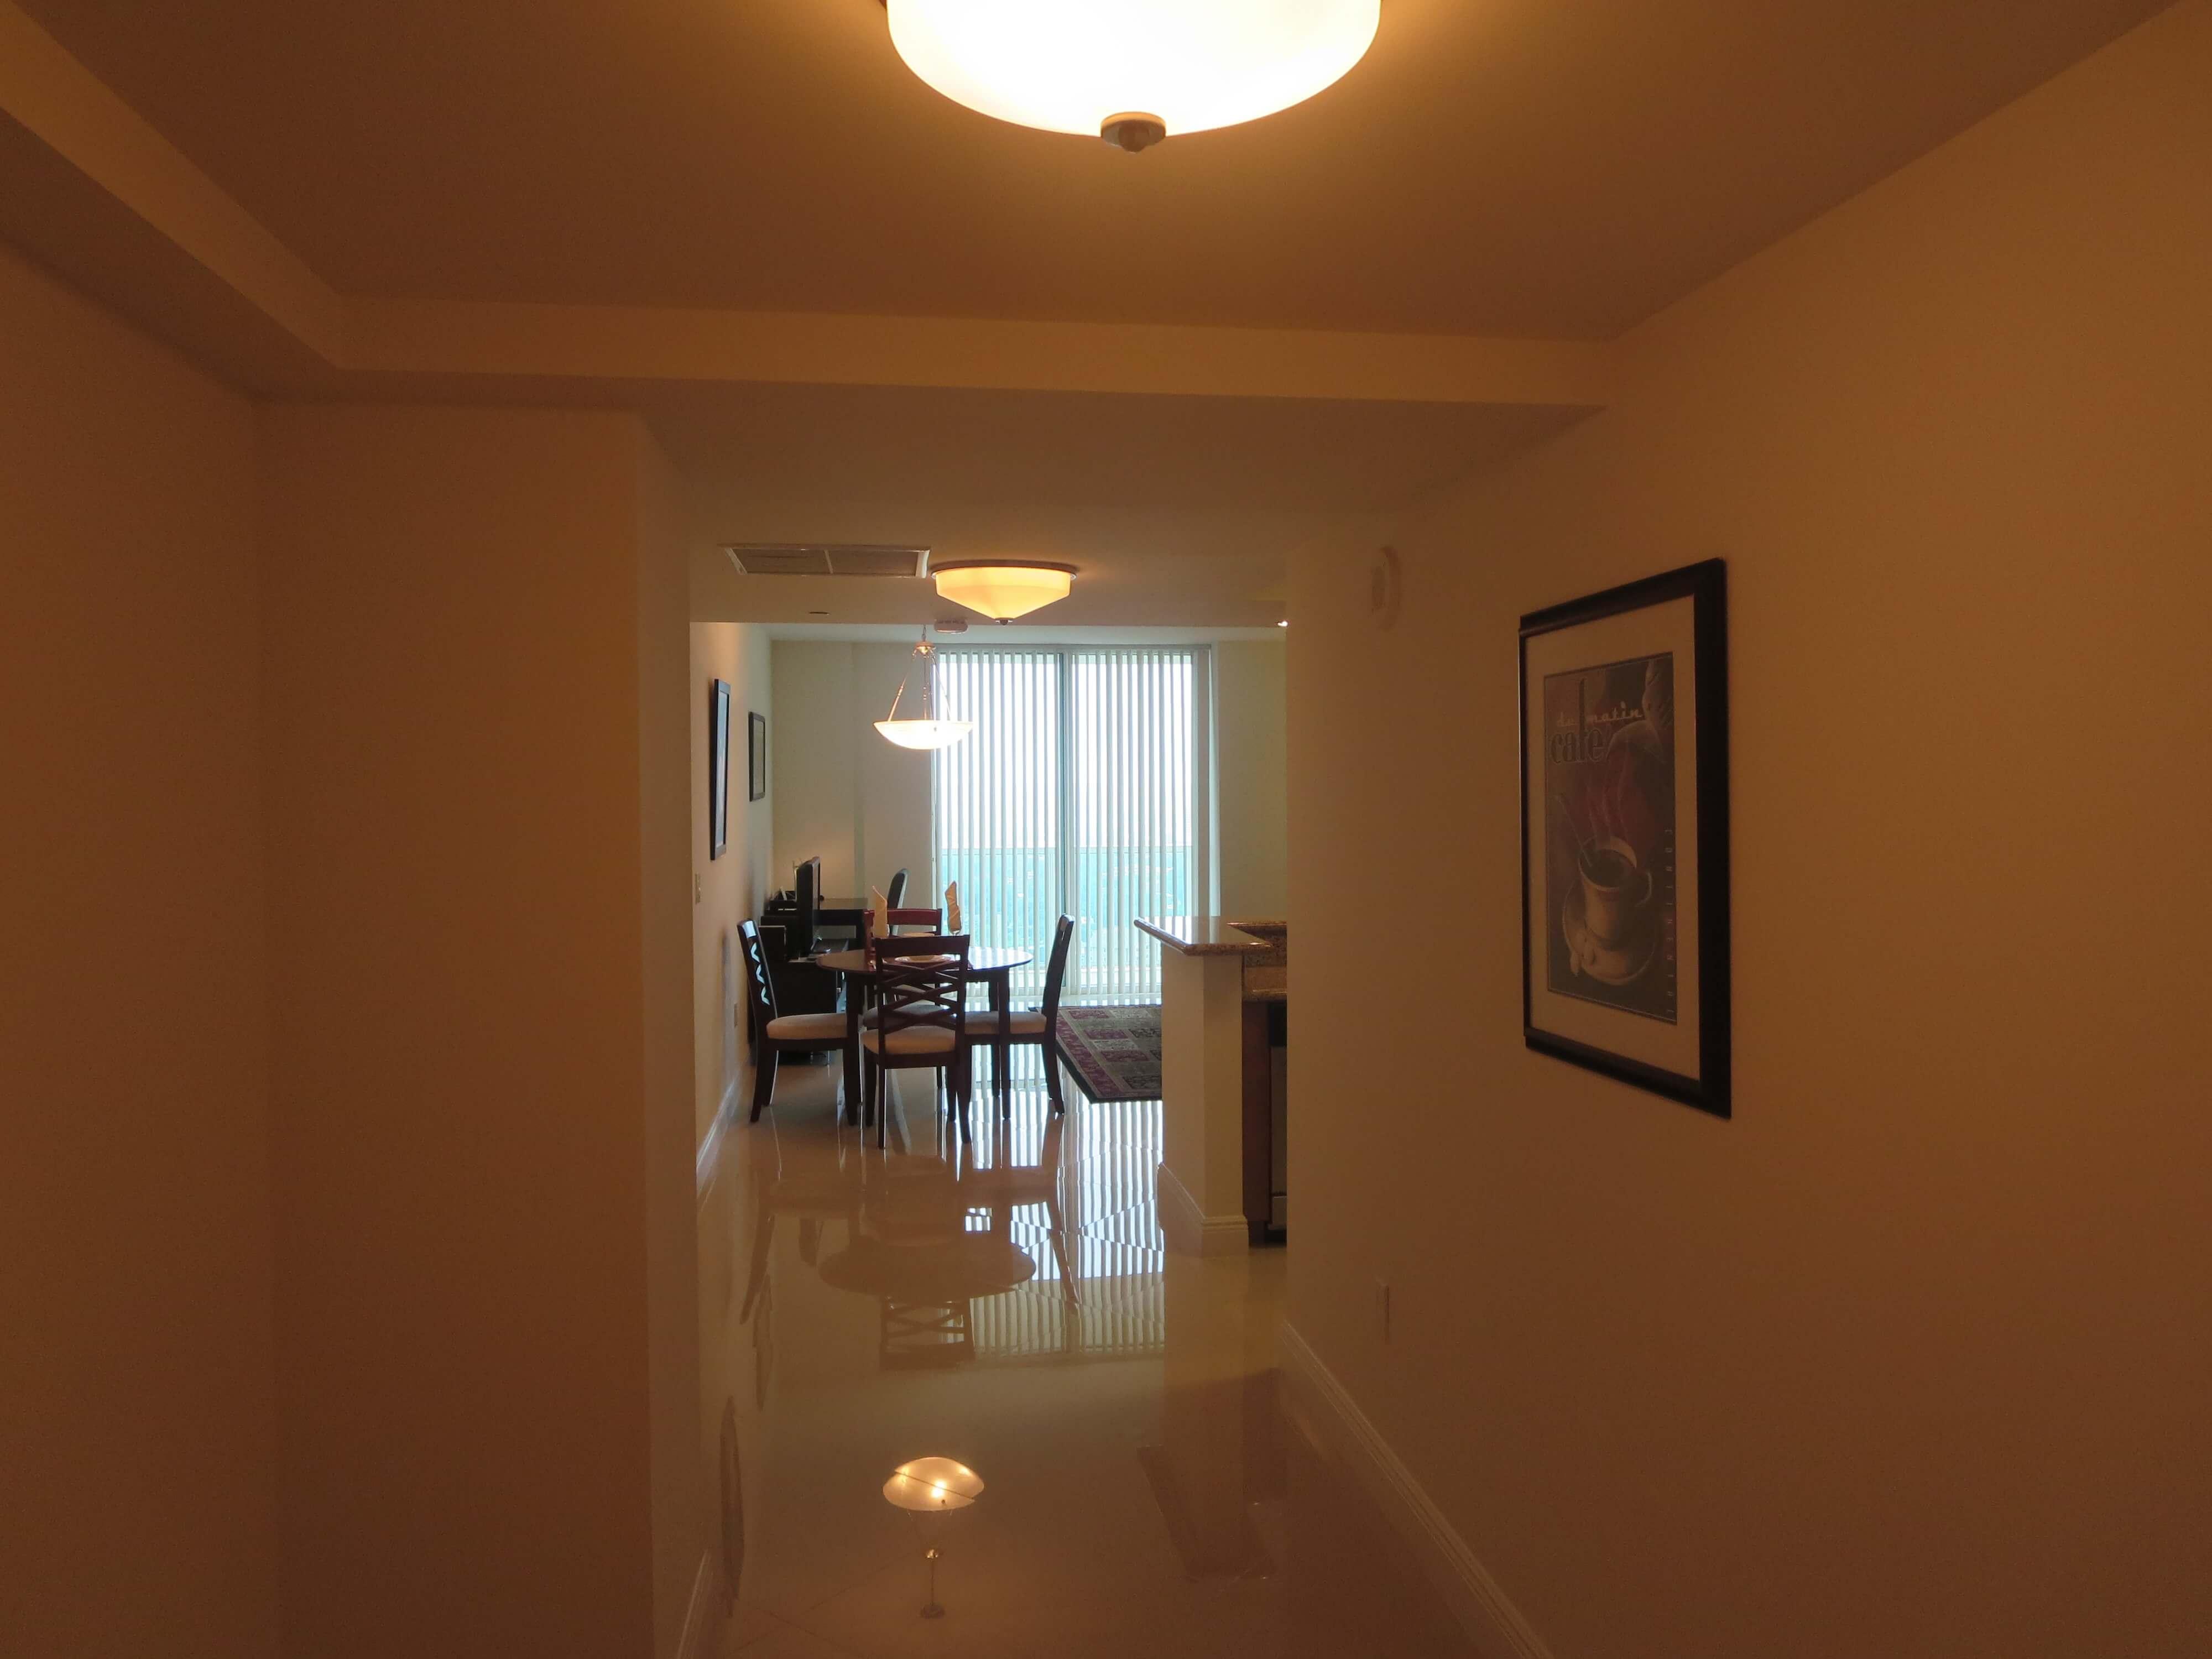 1BR Apartment for Rent on South Miami Avenue, Miami